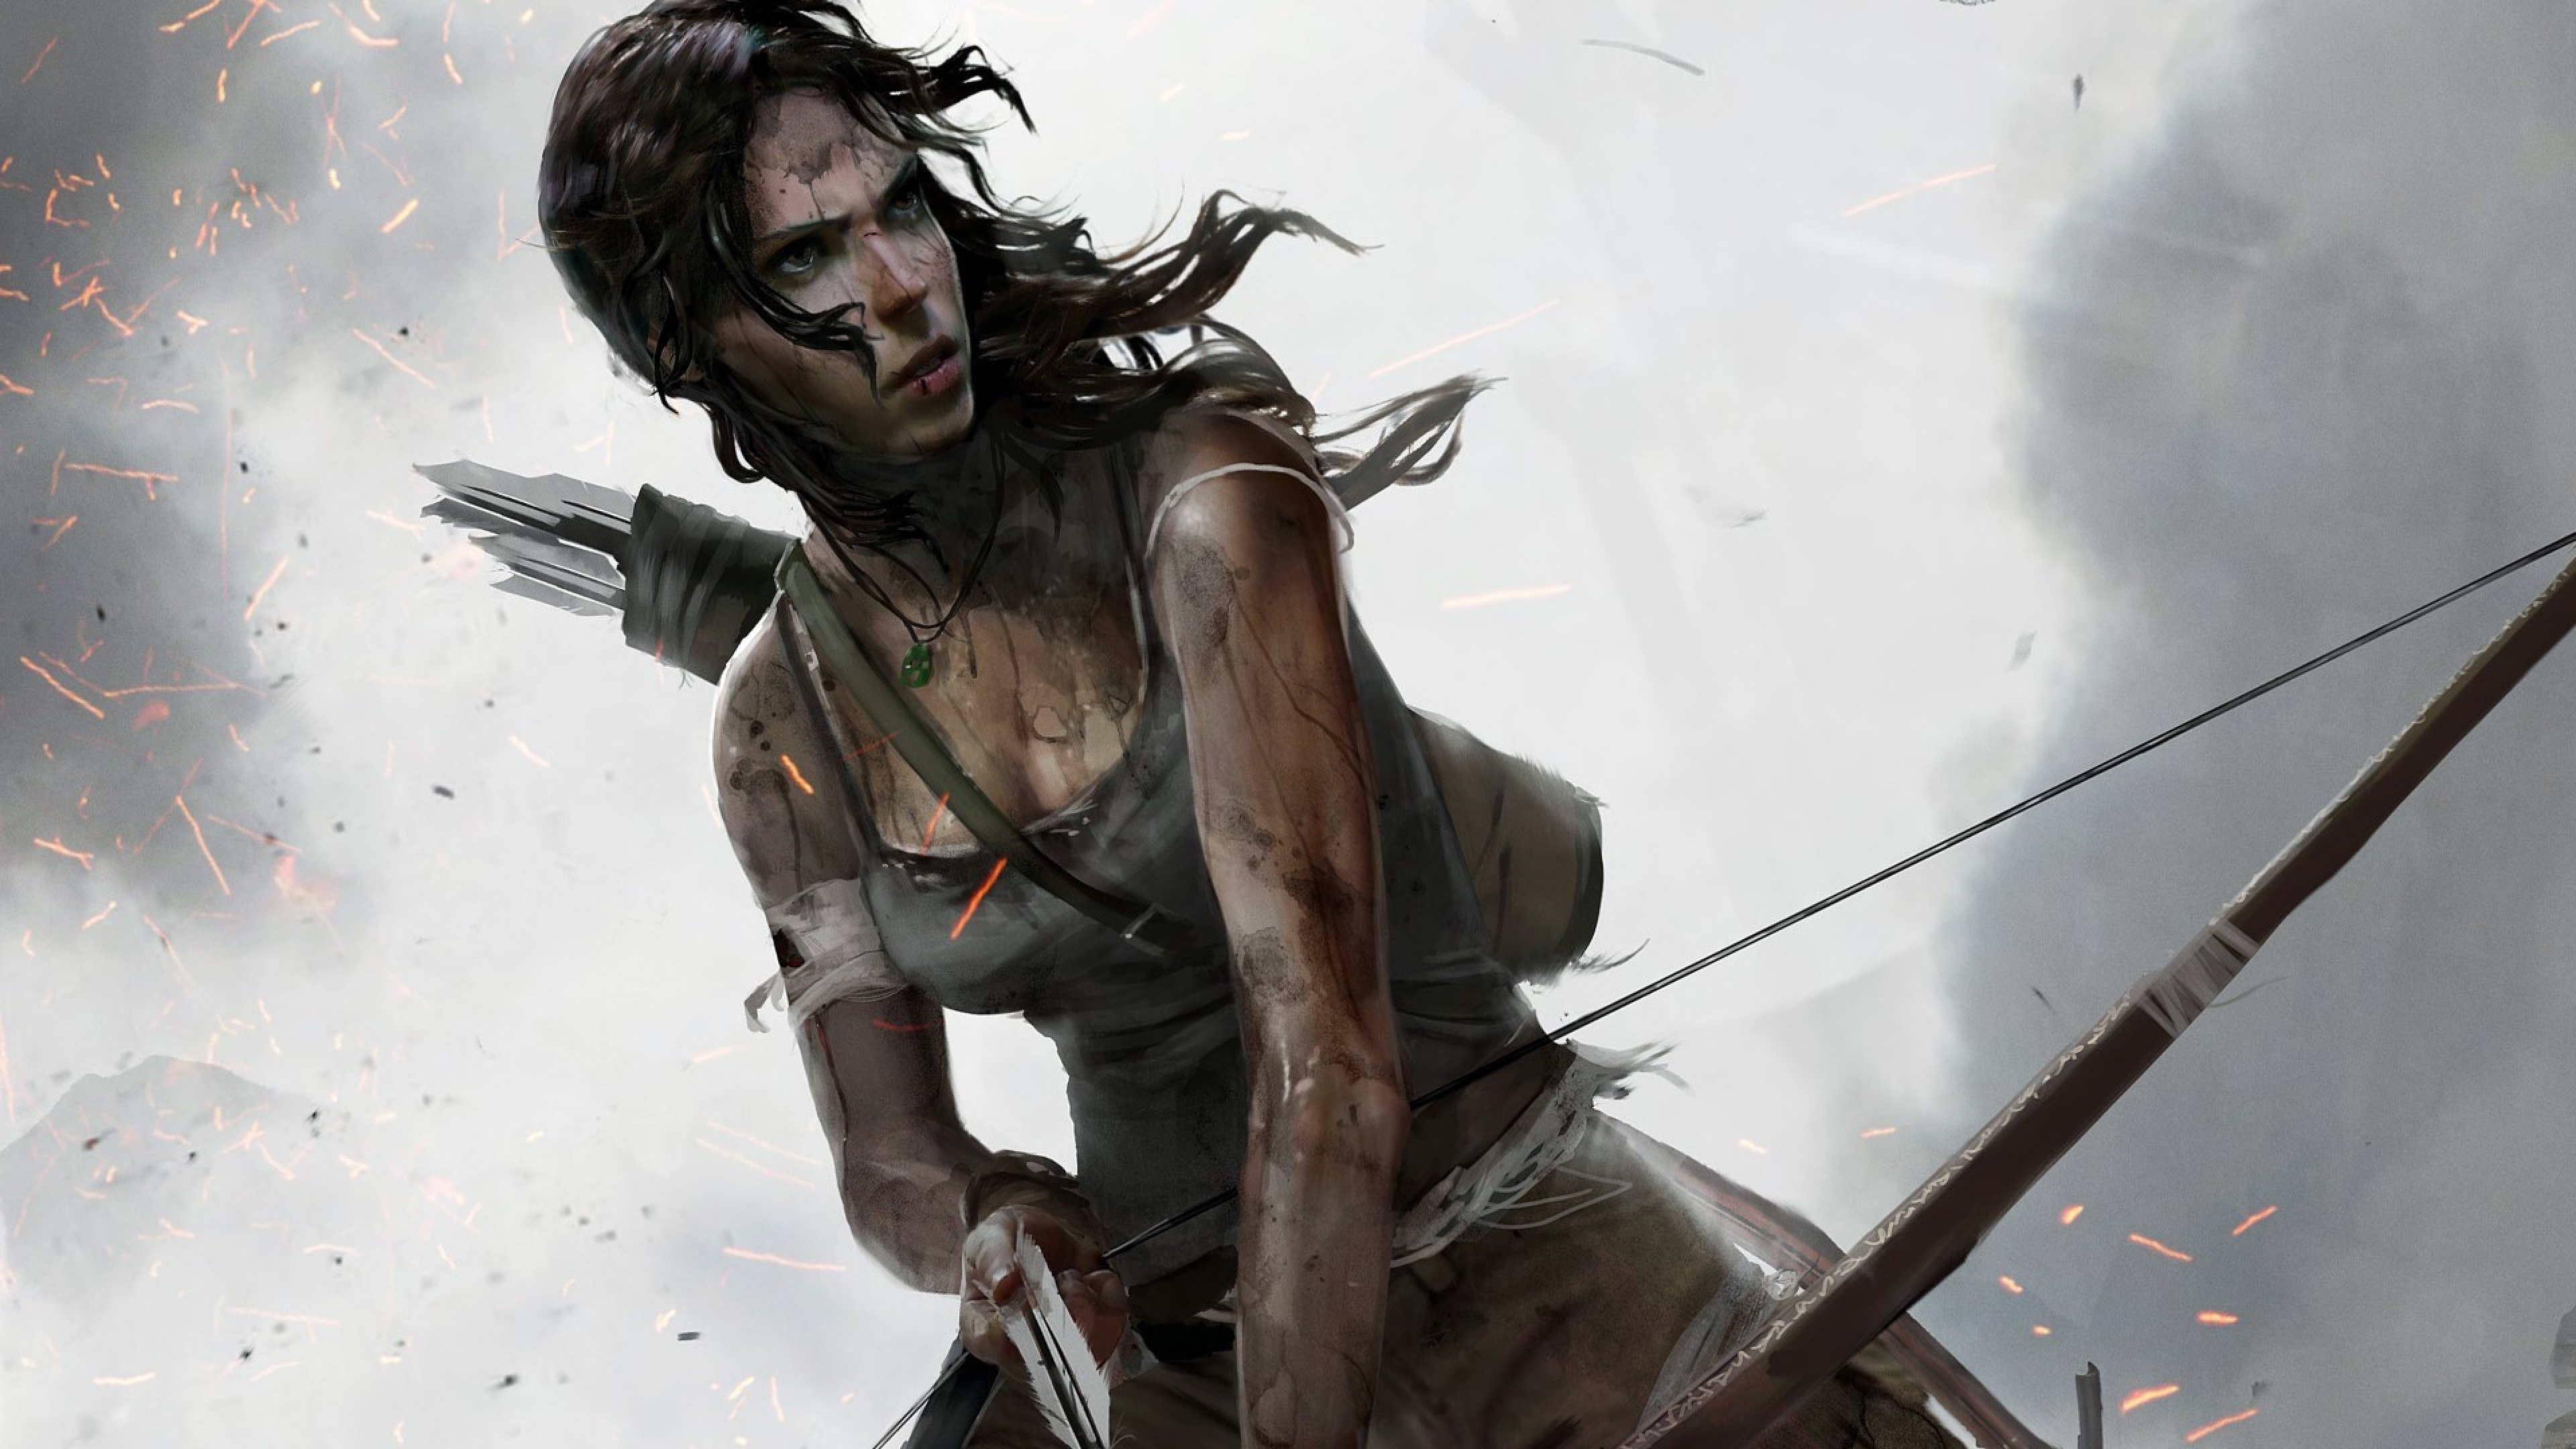 3840x2160 Tomb Raider Definitive Edition Lara Croft Tomb Raider